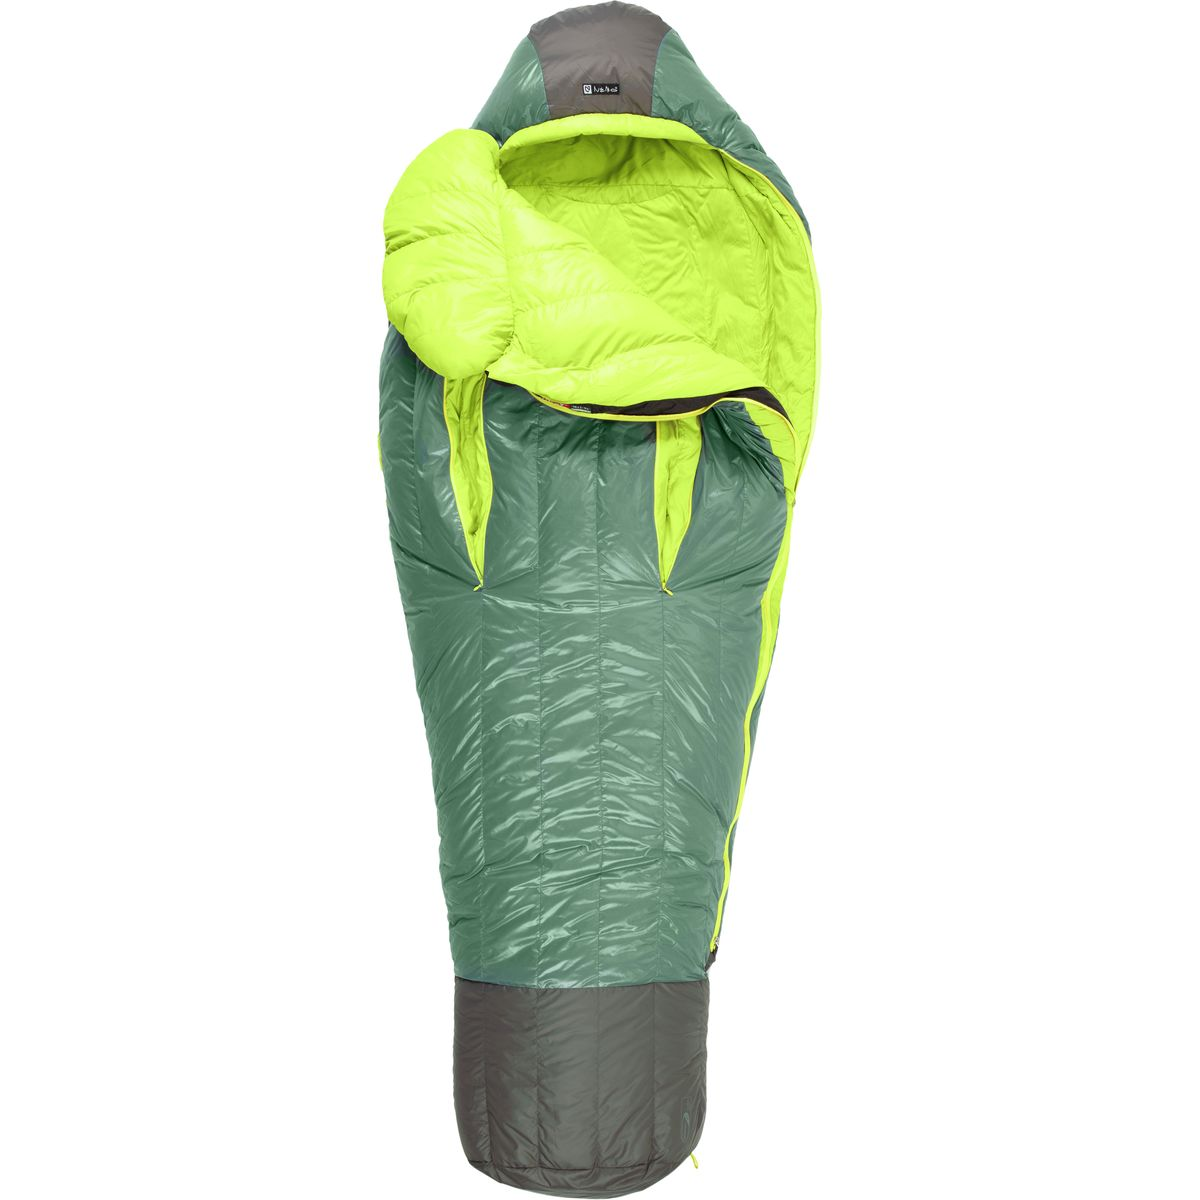 NEMO Equipment Inc. Ramsey 15 Sleeping Bag: 15 Degree Down One Color, Regular